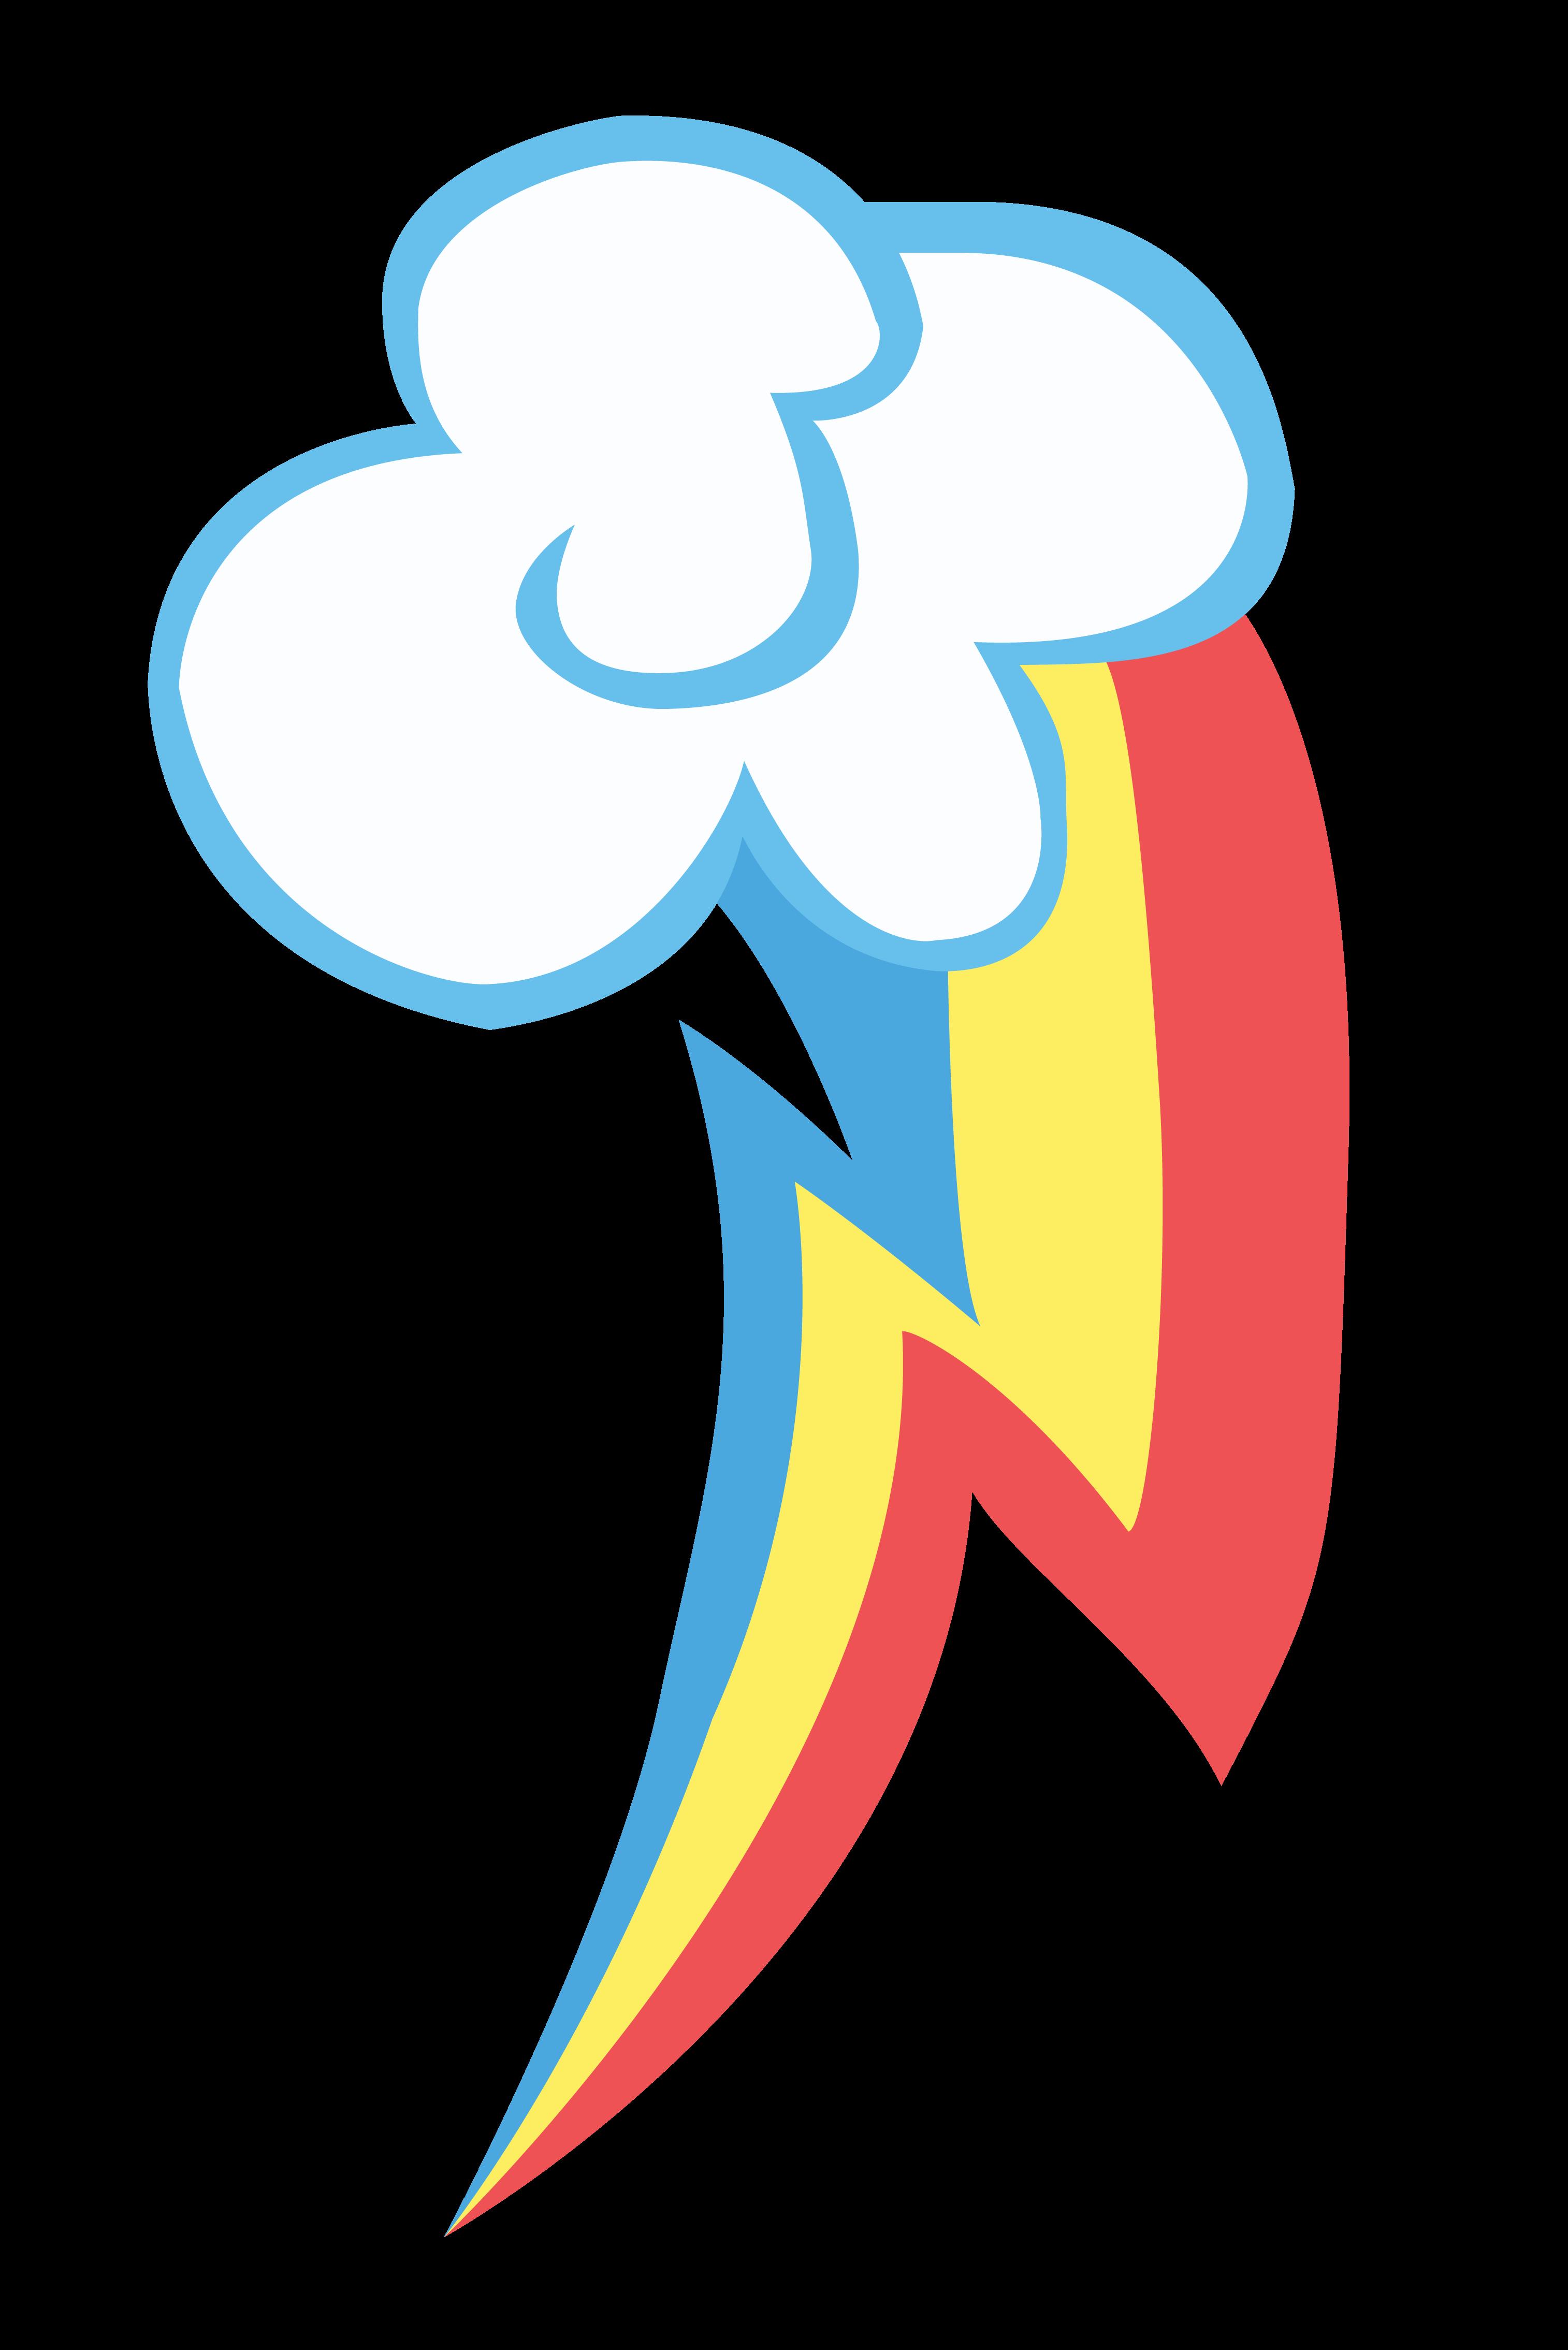 Rainbow Dash Cutie Mark Vector by MummifiedThunderbird on ...